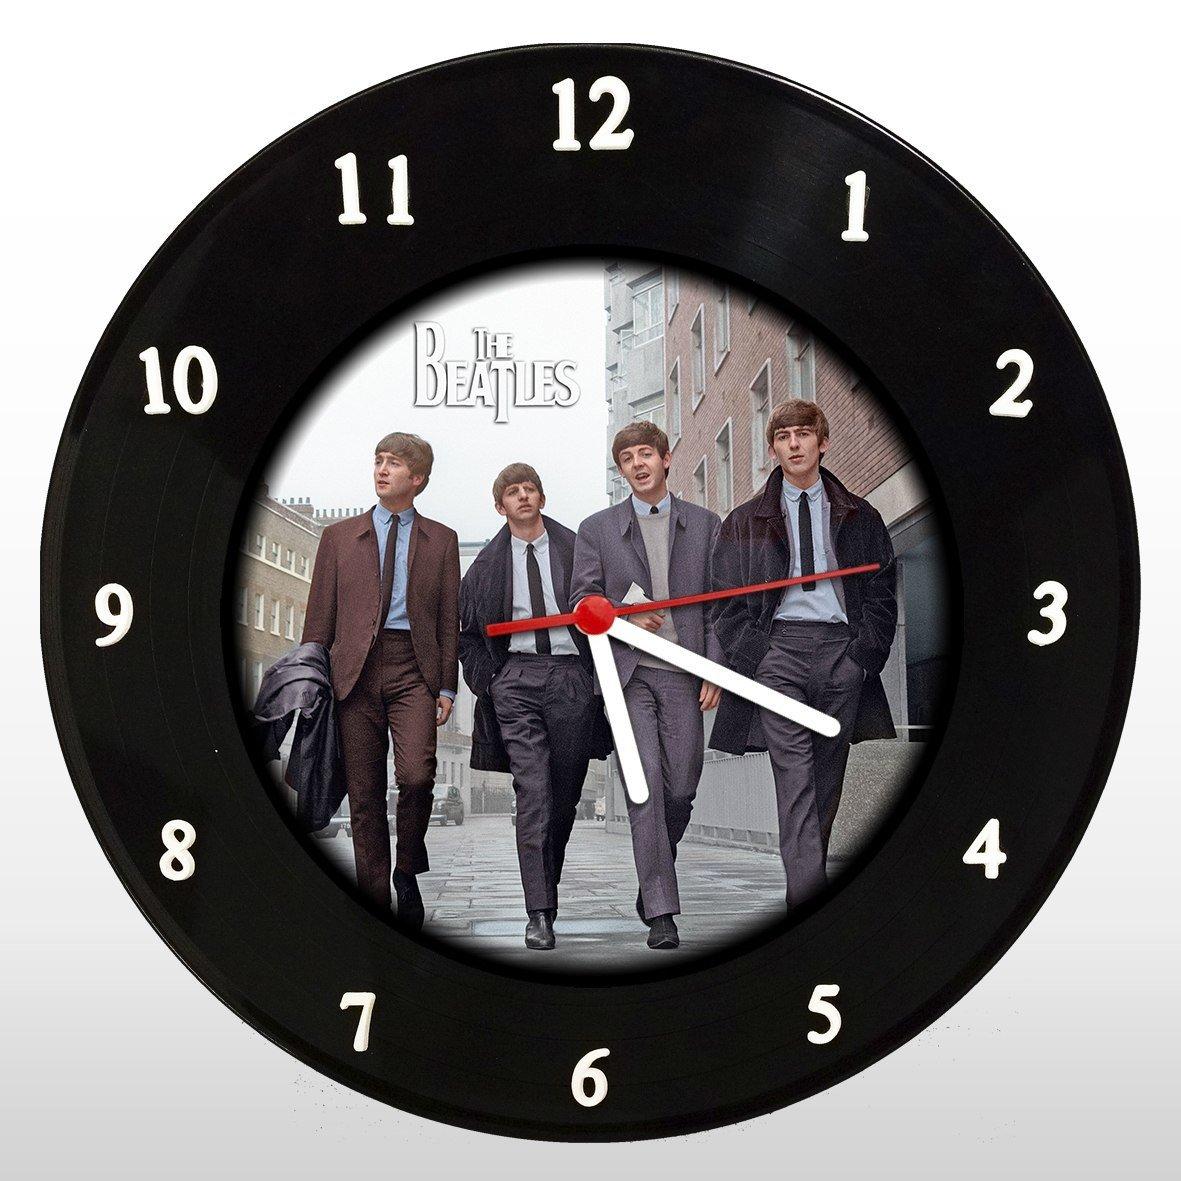 The Beatles - Banda - Relógio de Parede em Disco de Vinil - Mr. Rock